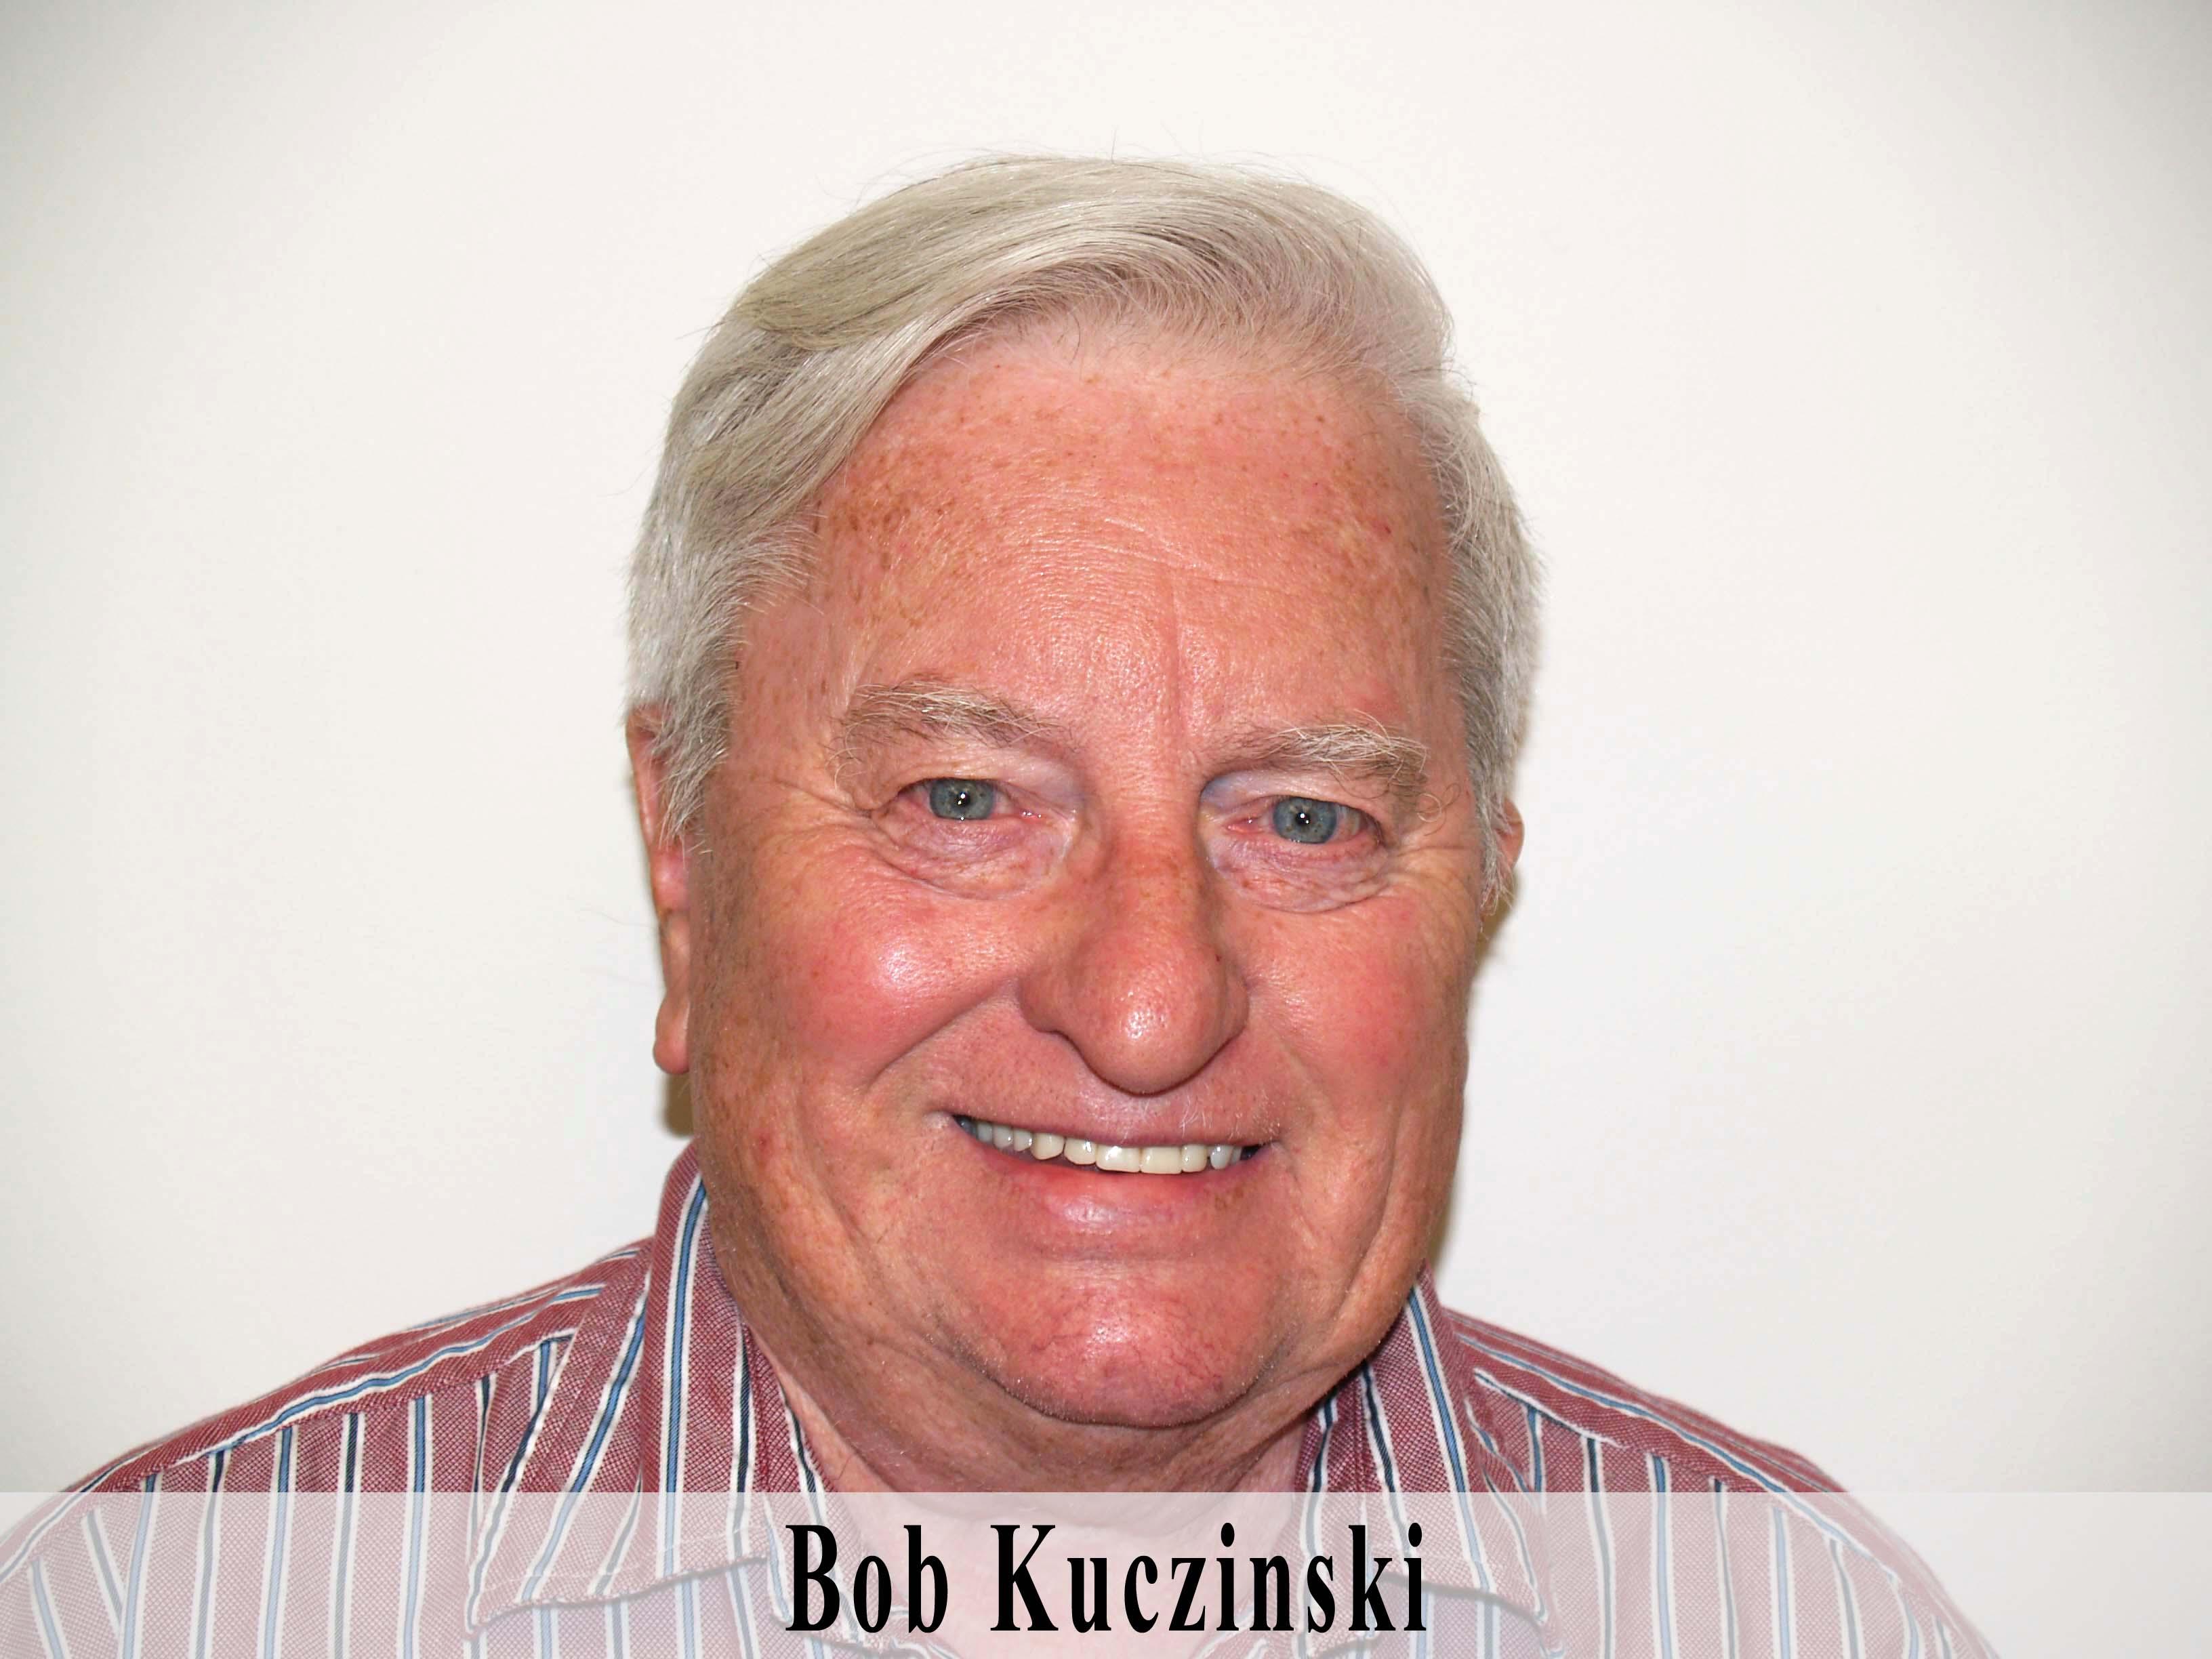 Bob Kuczynski